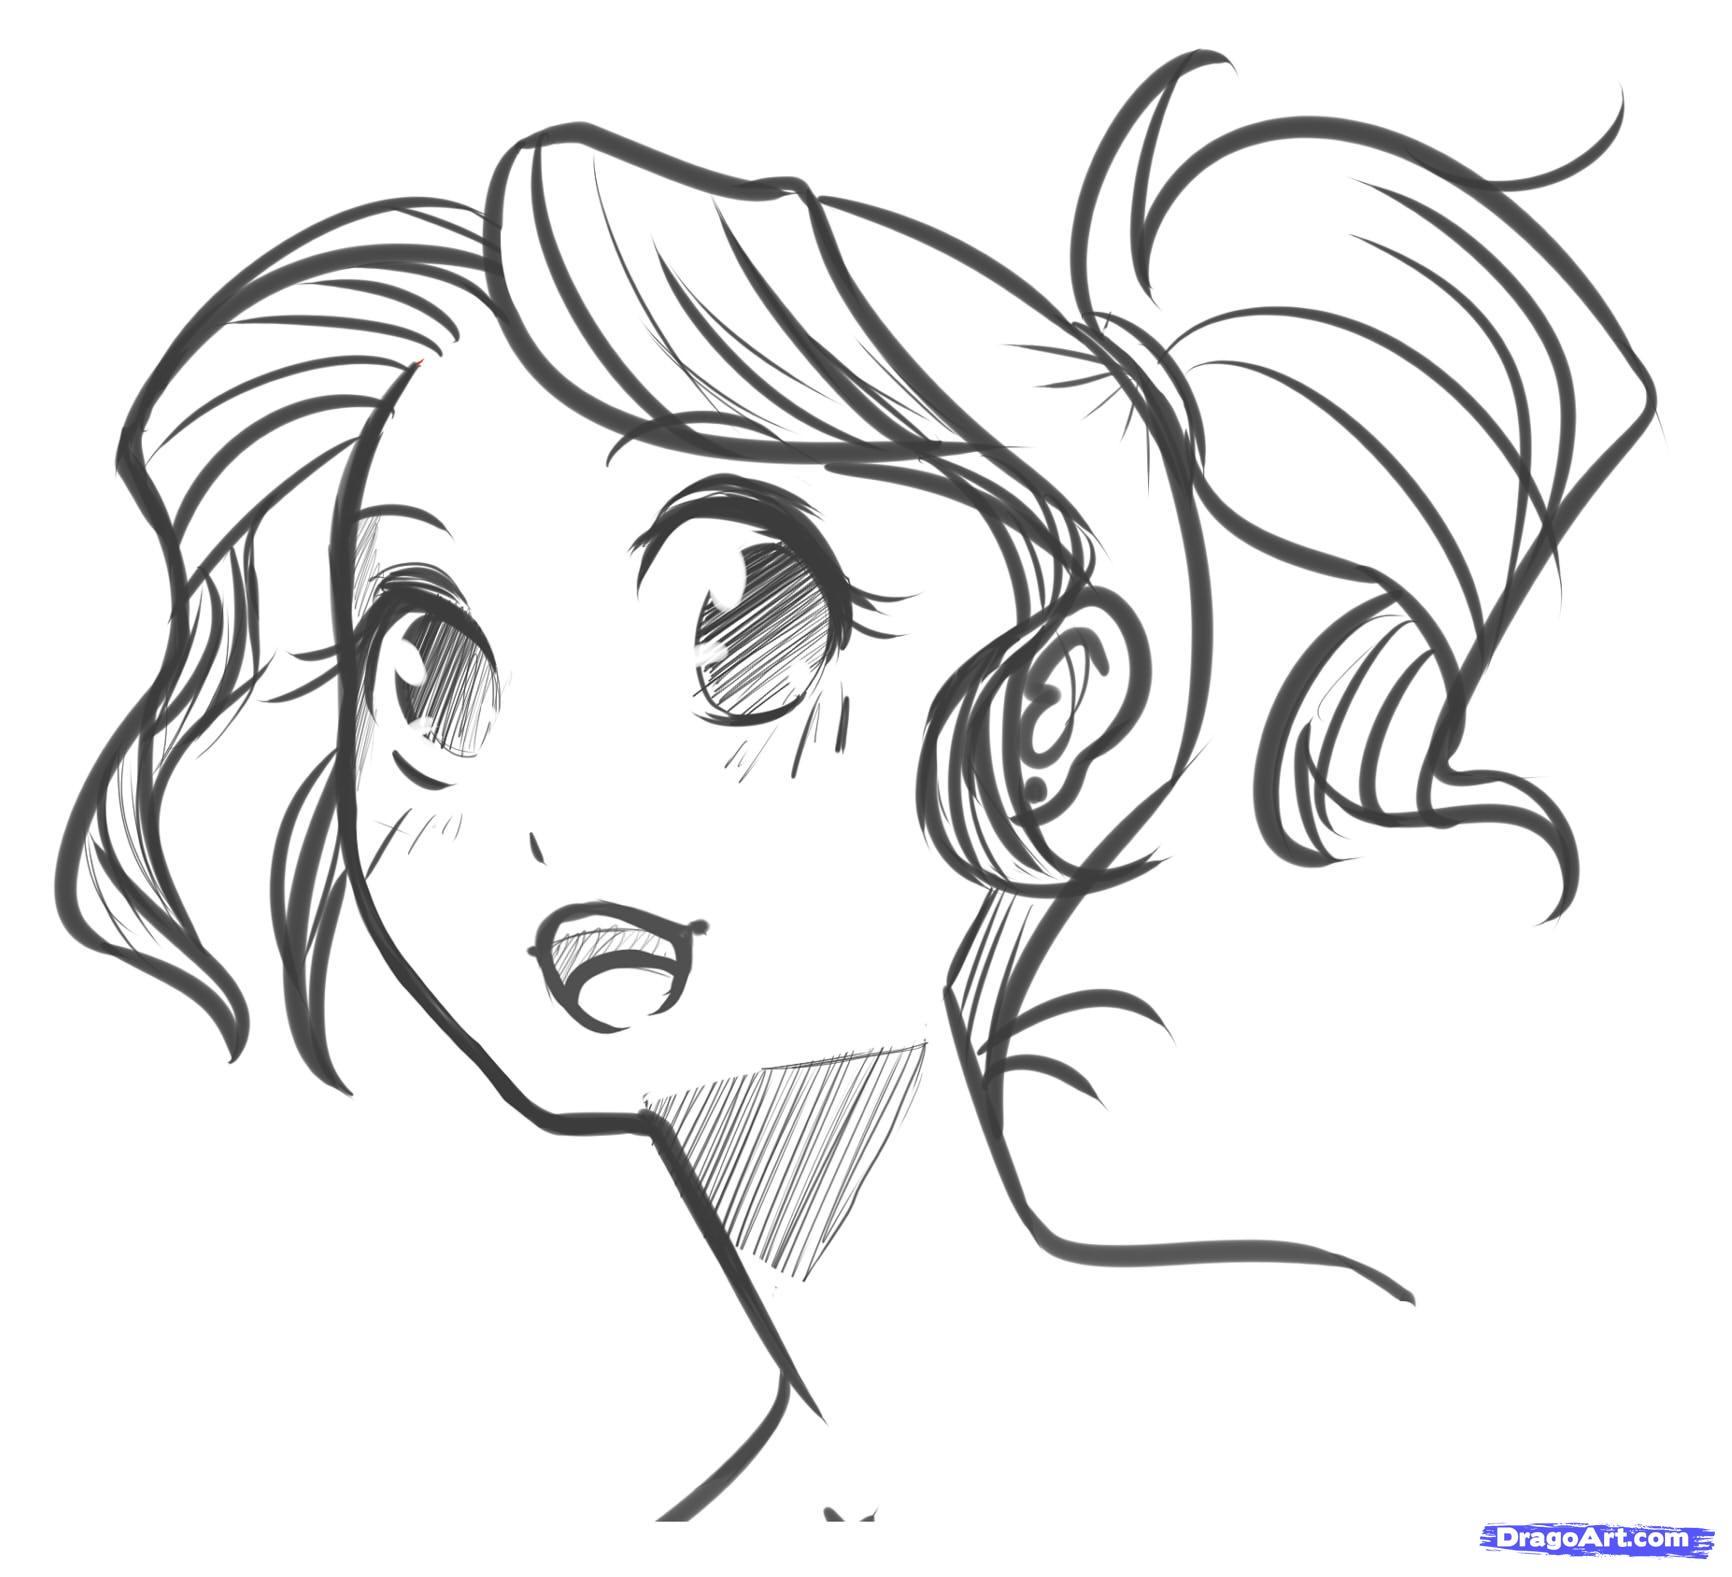 Рисуем лицо  девушки в стиле манга - шаг 19